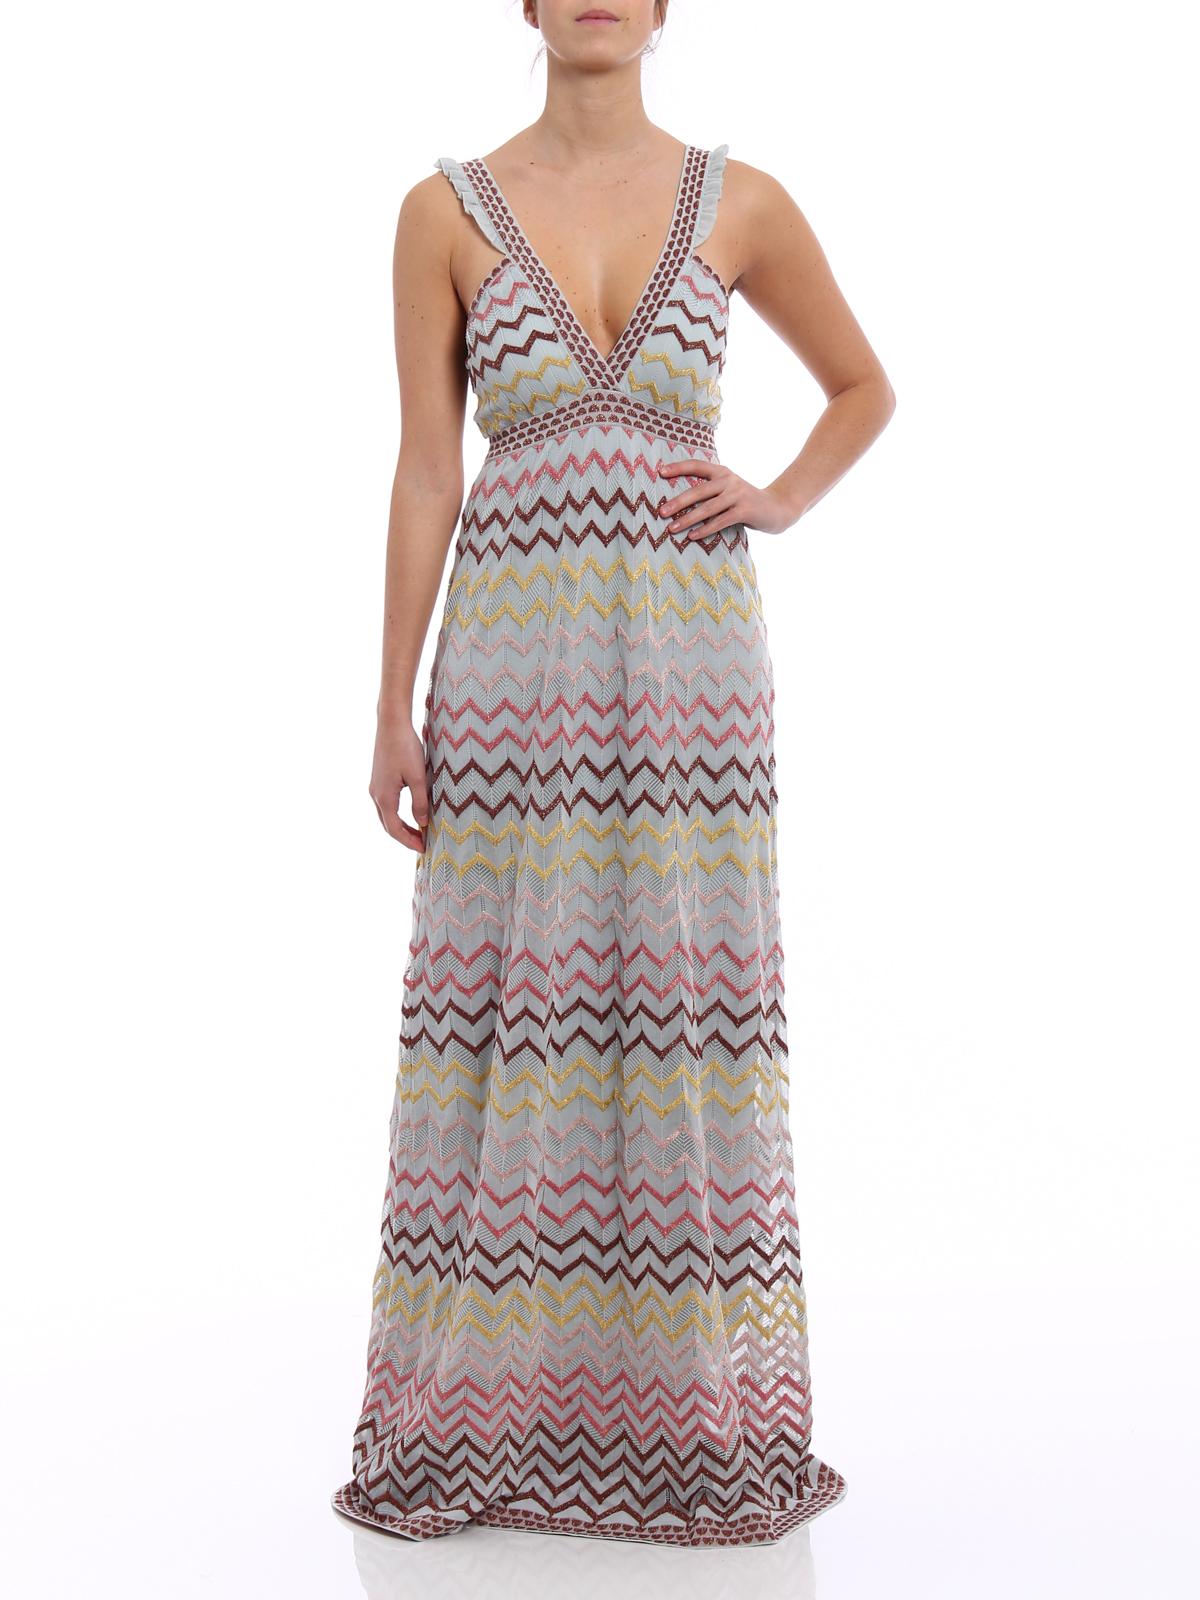 V-neckline knitted maxi dress by M Missoni - maxi dresses | Shop ...